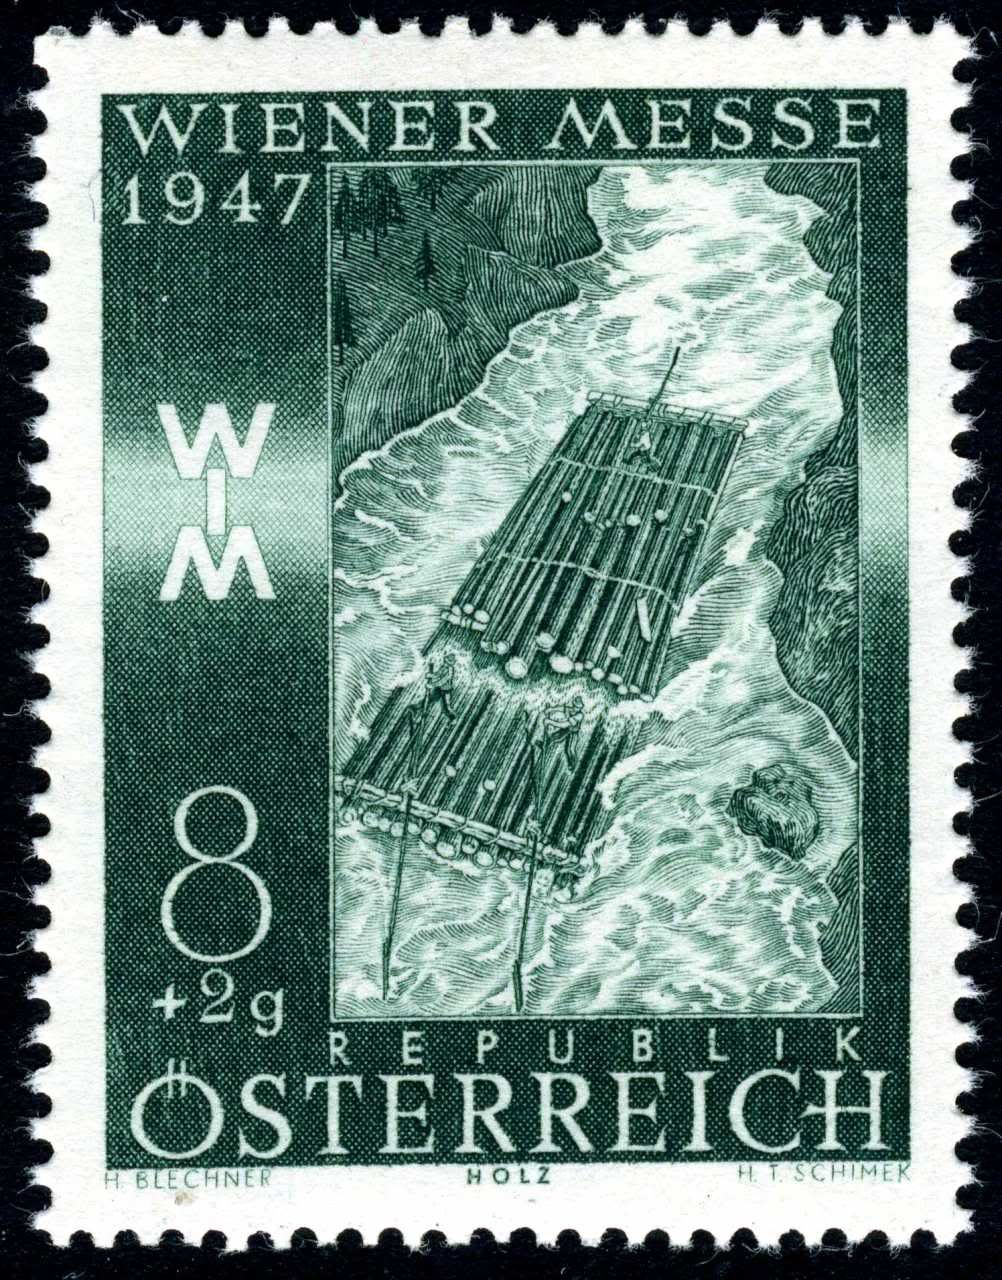 Austria 1947 engraved by Schimek | Stamp, Post stamp, Stamp